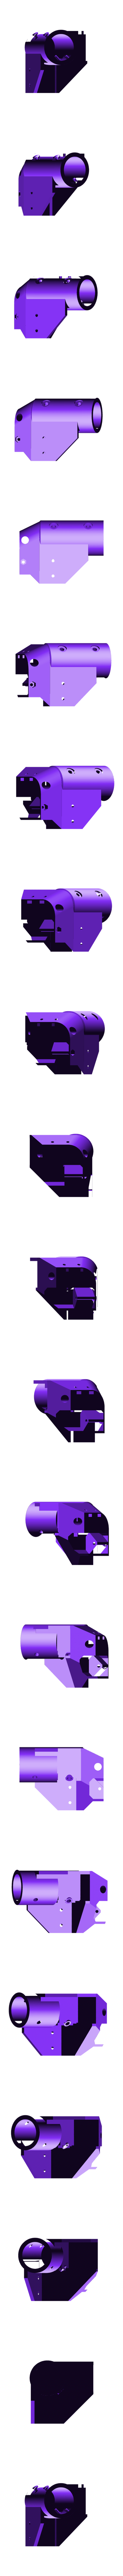 corner_back_left.stl Download free STL file FDM Printer de Kleine Reus 300x300x900 • 3D printable object, Job